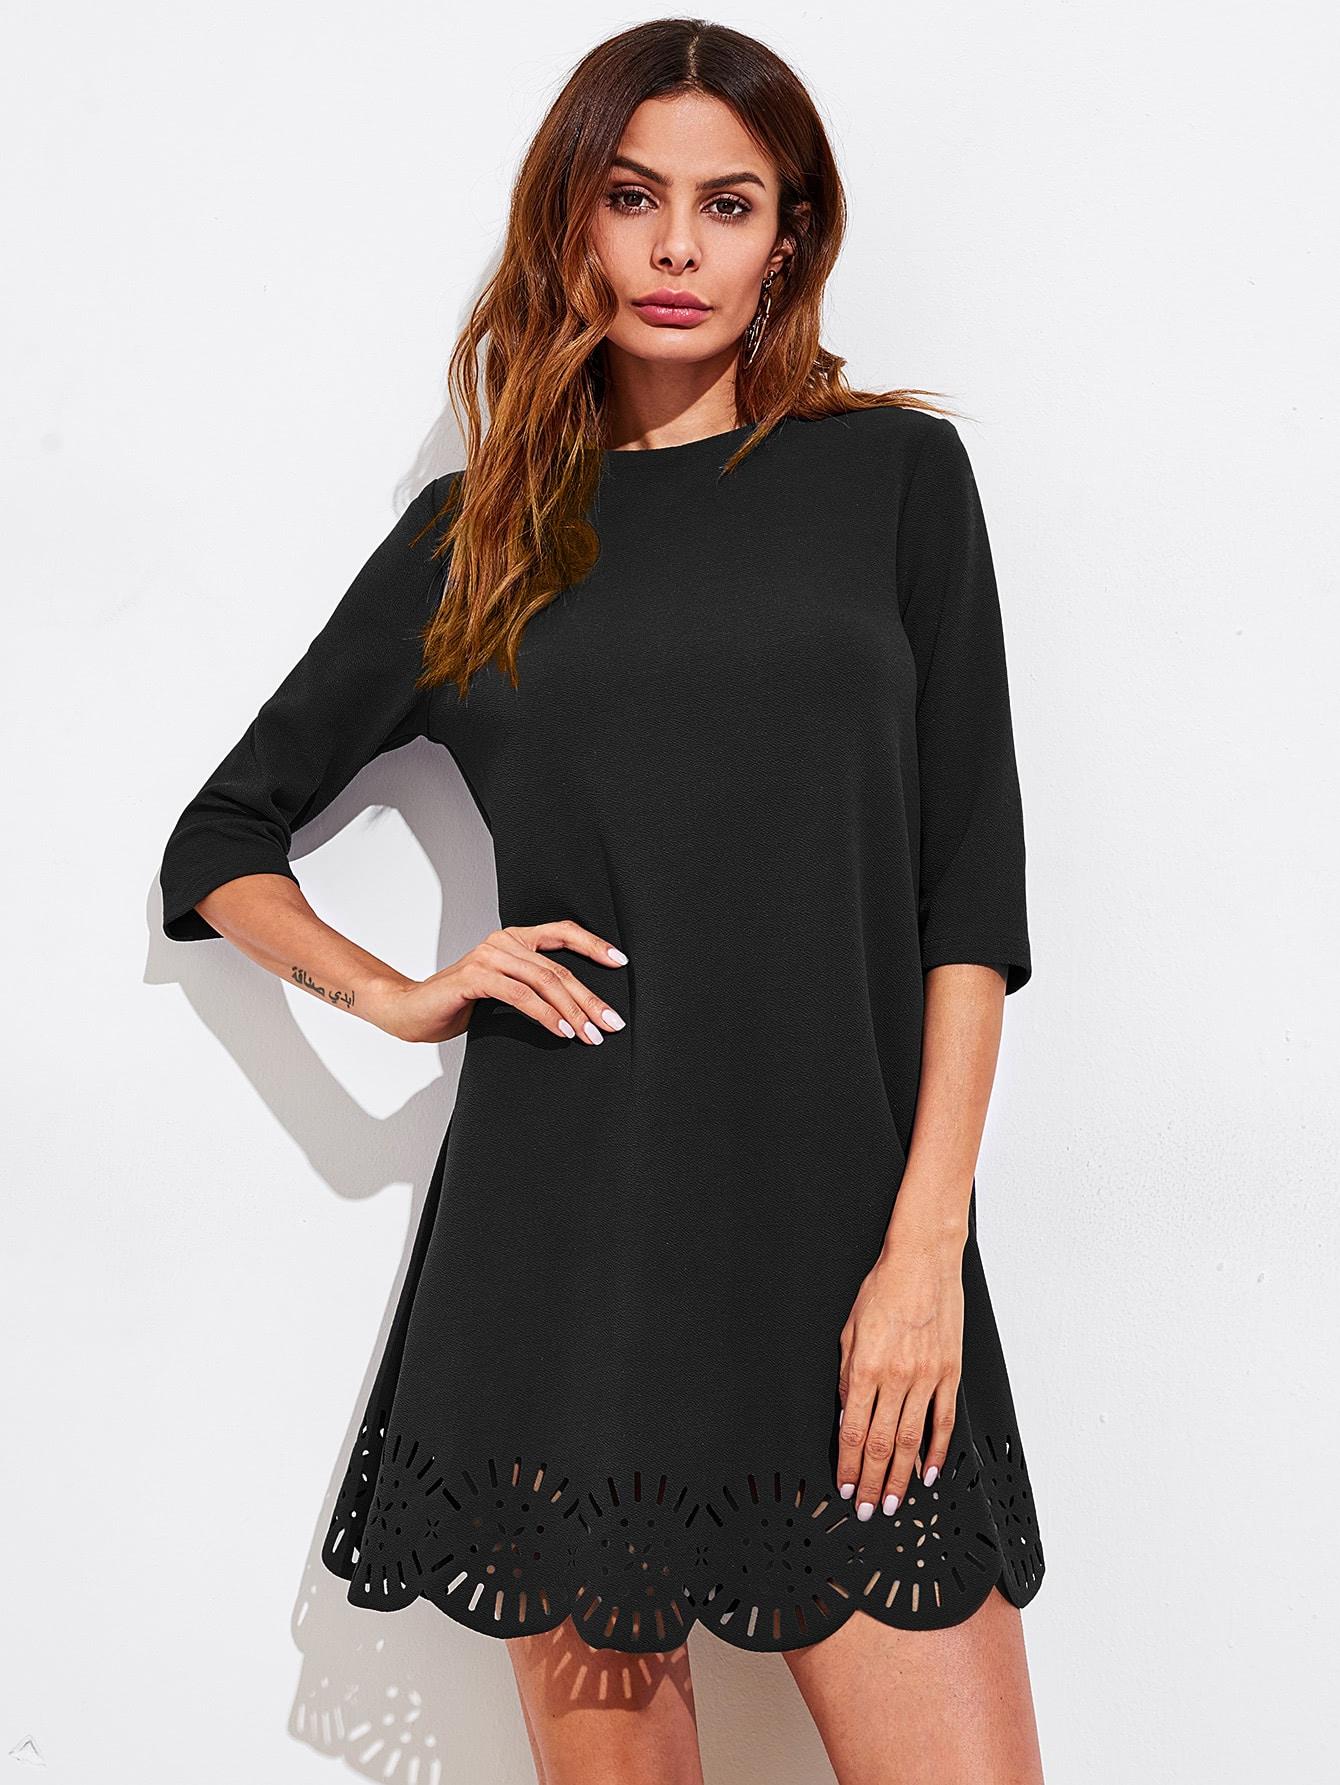 Scallop Laser Cut Hem Swing Dress scallop laser cut form fitting dress